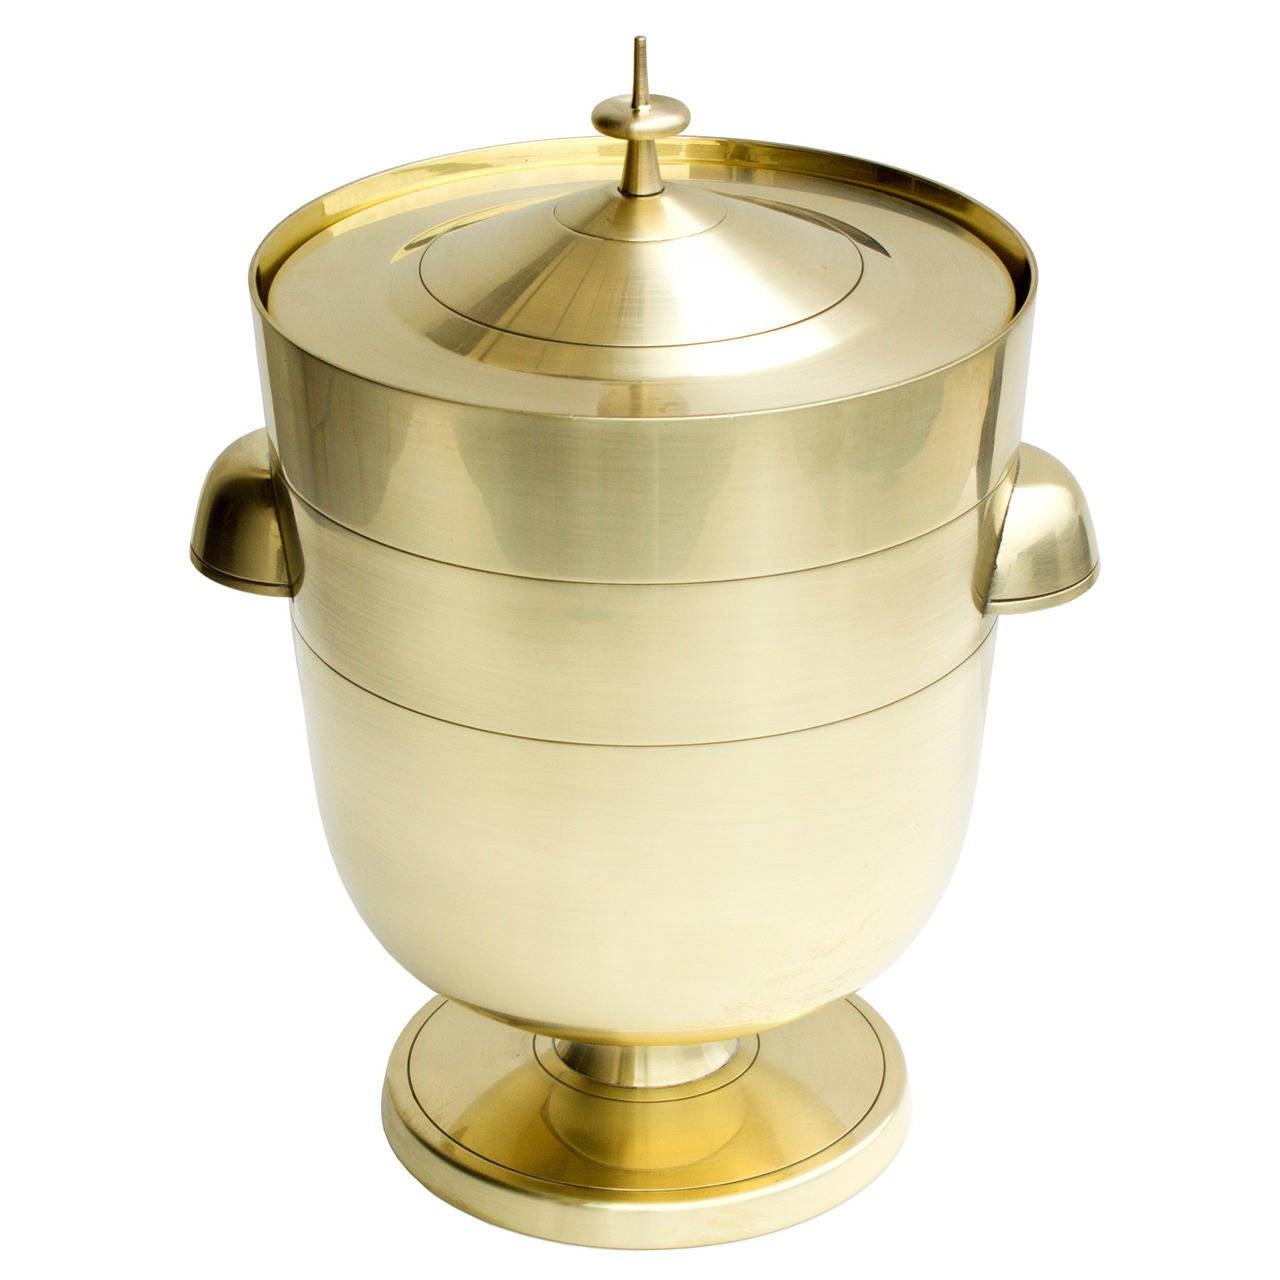 tommi parzinger brass ice bucket with mercury glass liner for sale  - tommi parzinger brass ice bucket with mercury glass liner